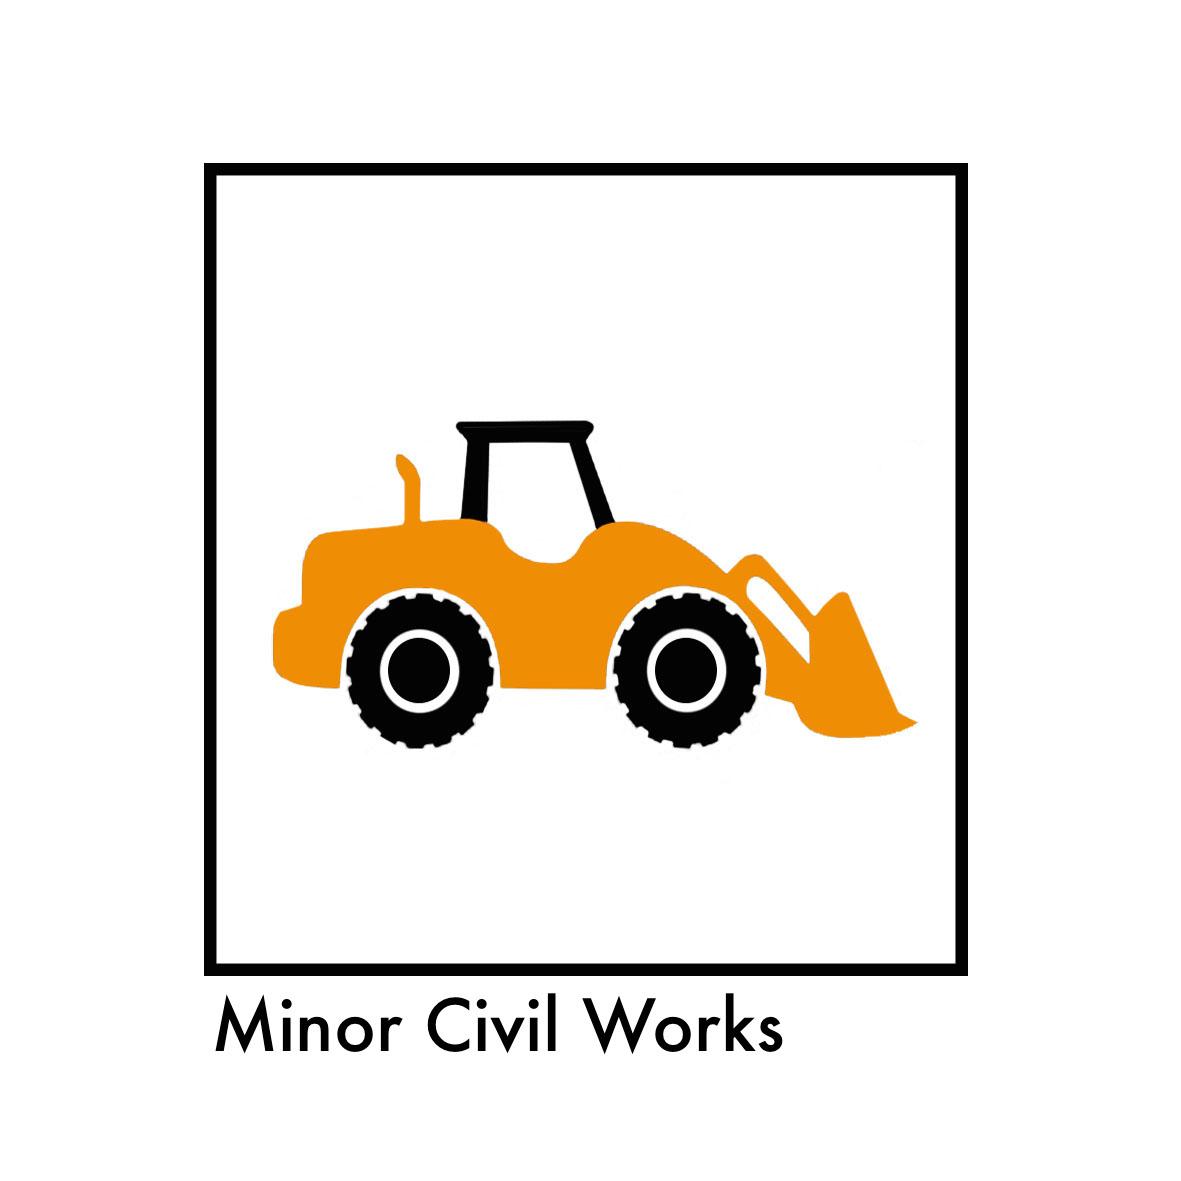 Minor Civil Works